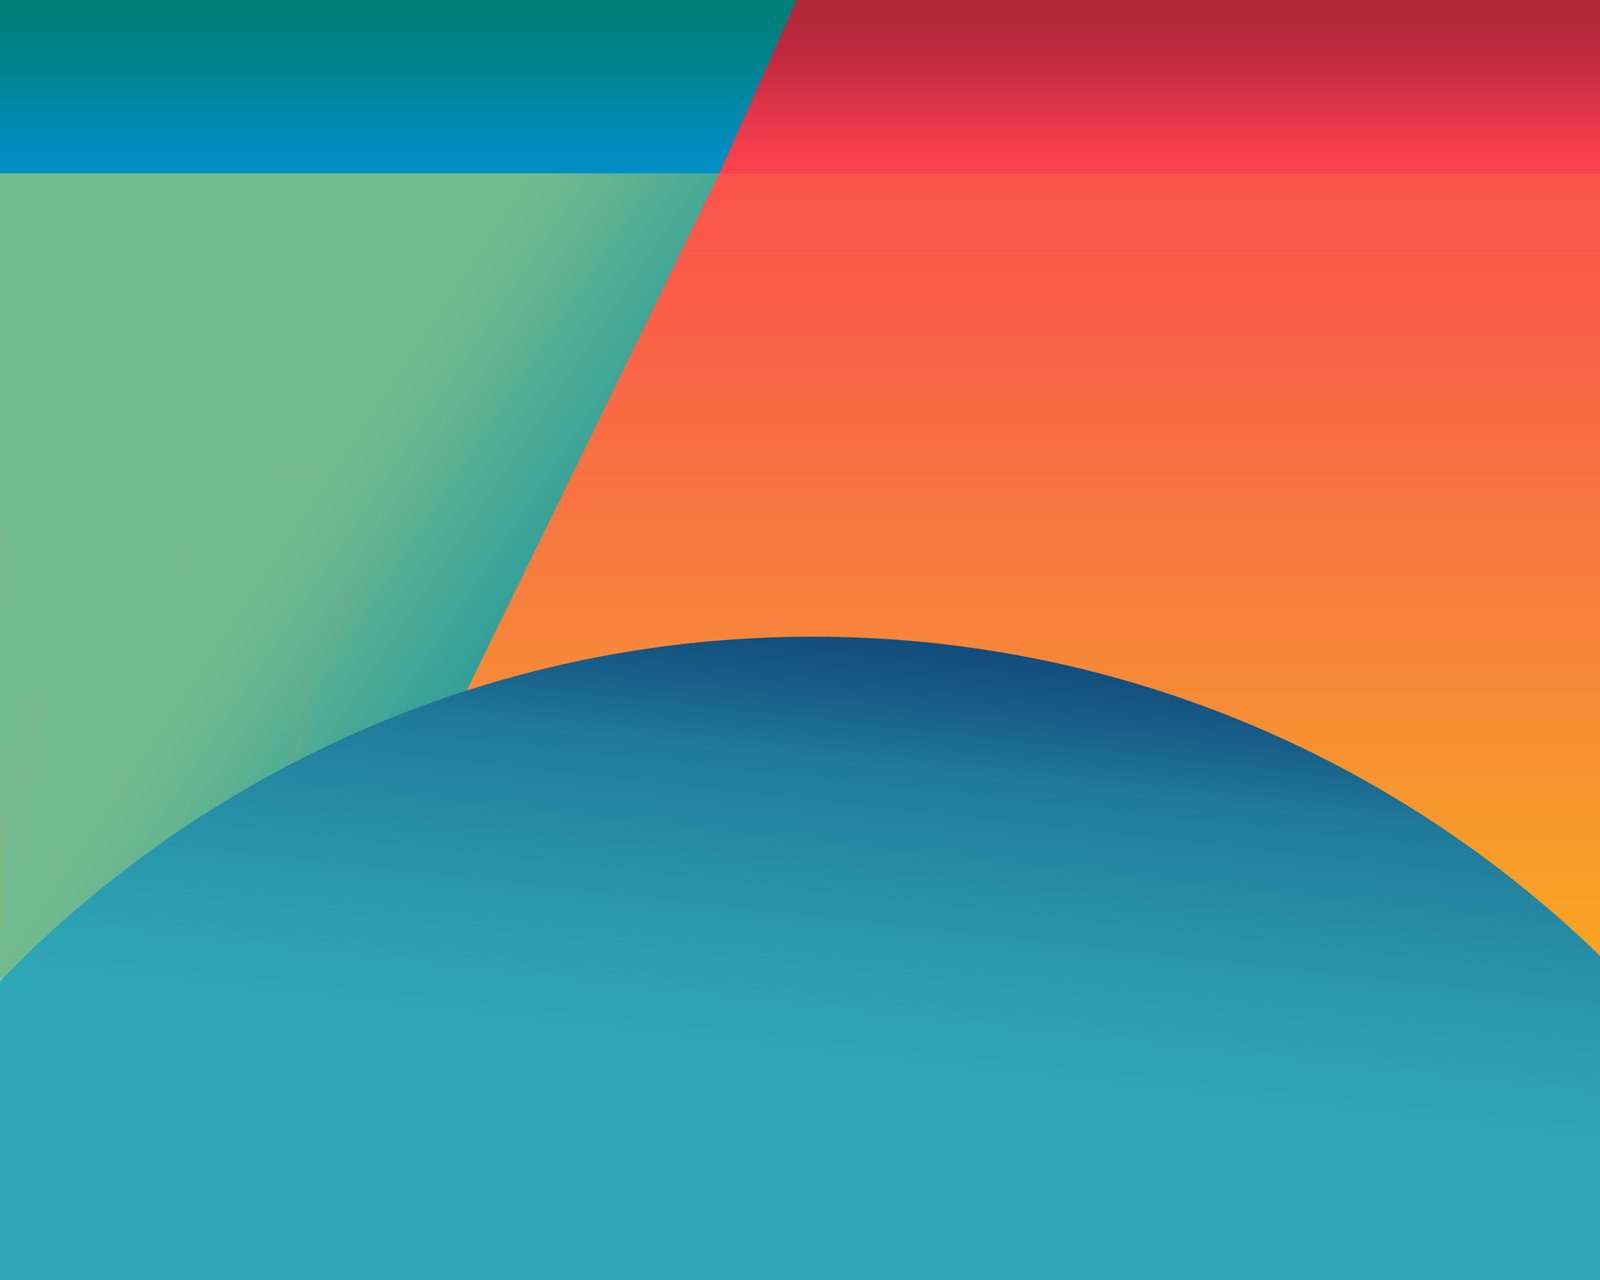 Hd wallpaper xda - Nexus 5 Wallpaper By Kxrider369 Customization Wallpaper Abstract 2013